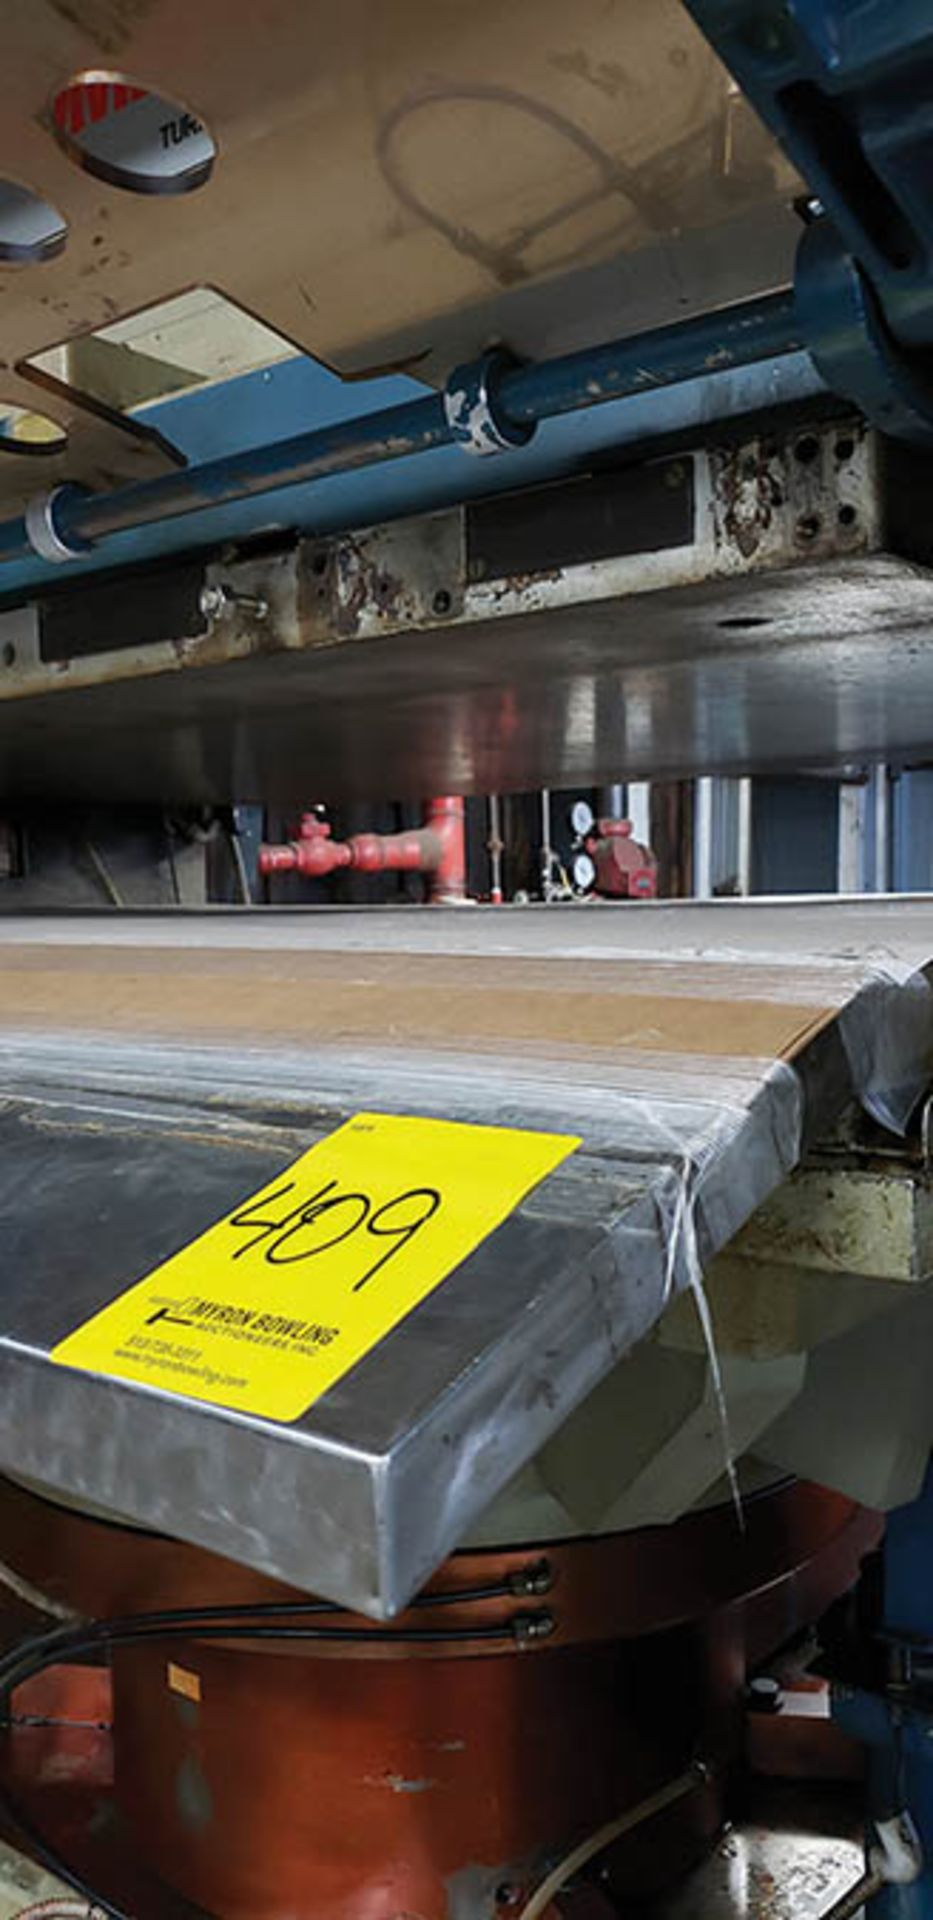 Lot 409 - 1995 TAMBONI 850-TON UP ENDING HYDROPLATING/EMBOSSING PRESS, TYPE 085, S/N 443, 1370 MM X 1000 MM